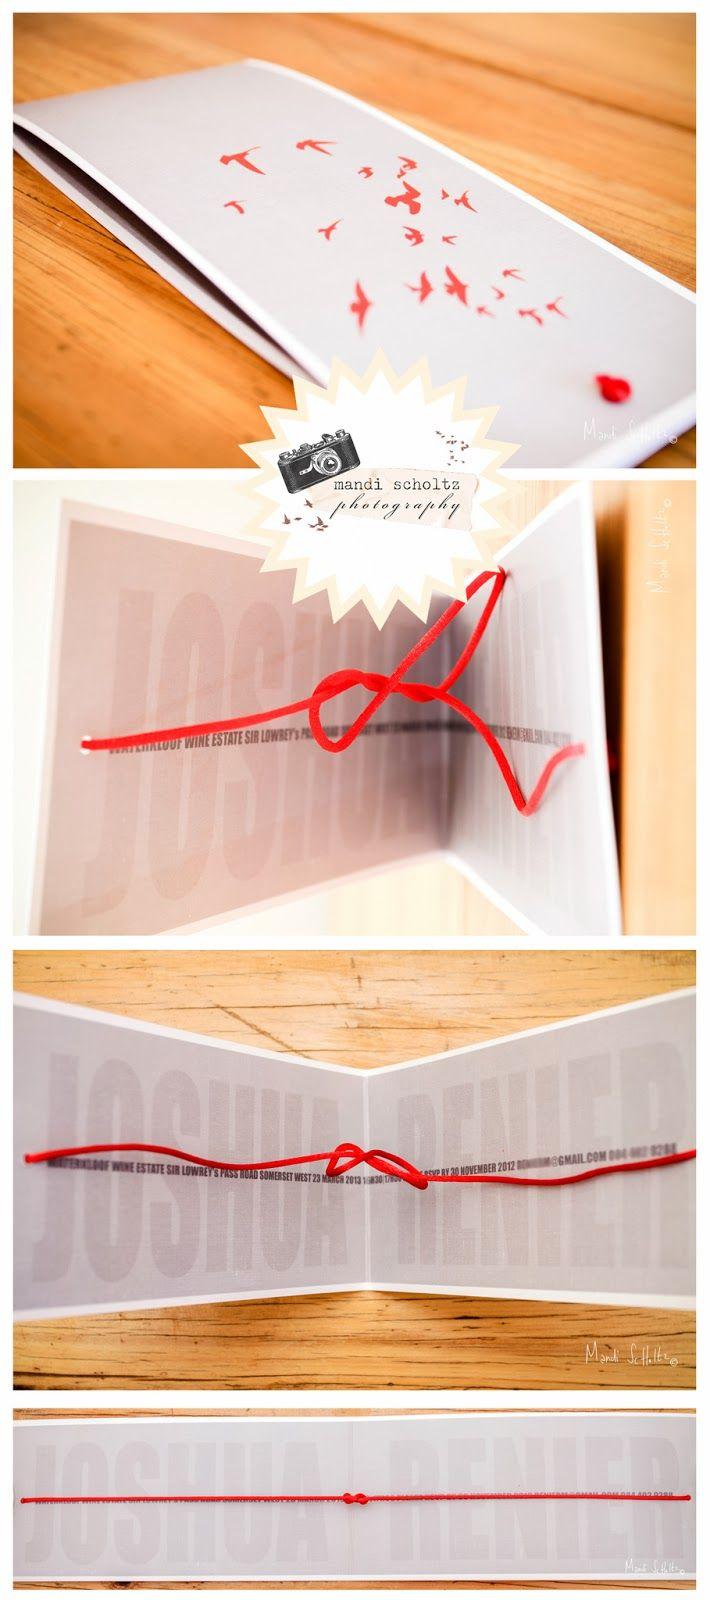 Mandi Scholtz Photography: Tying the knot wedding invite!